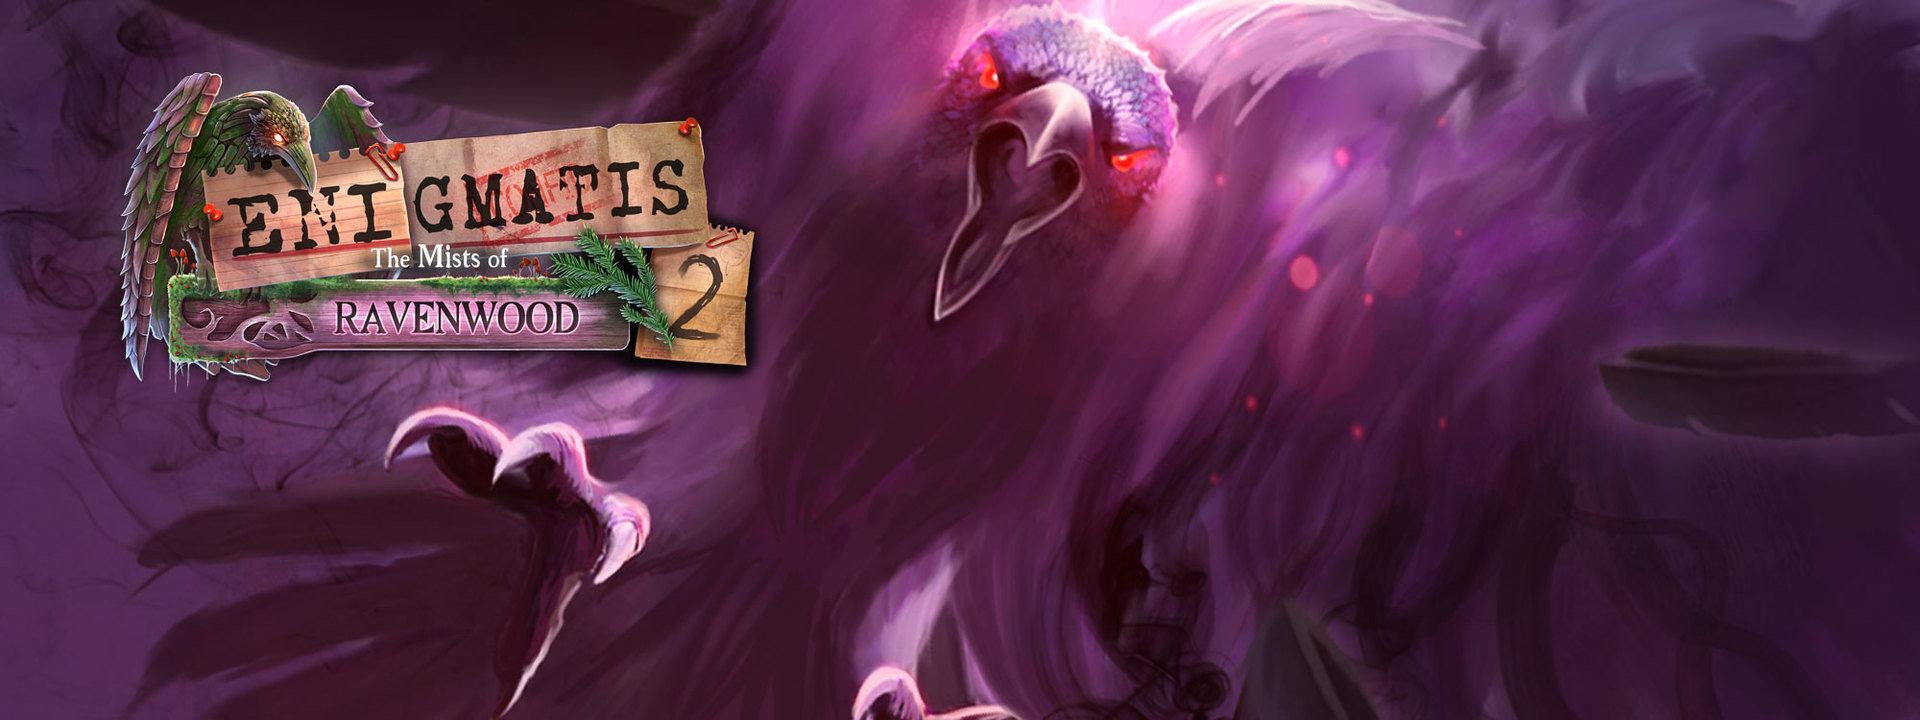 Artifex Mundi Debuts on Nintendo Switch